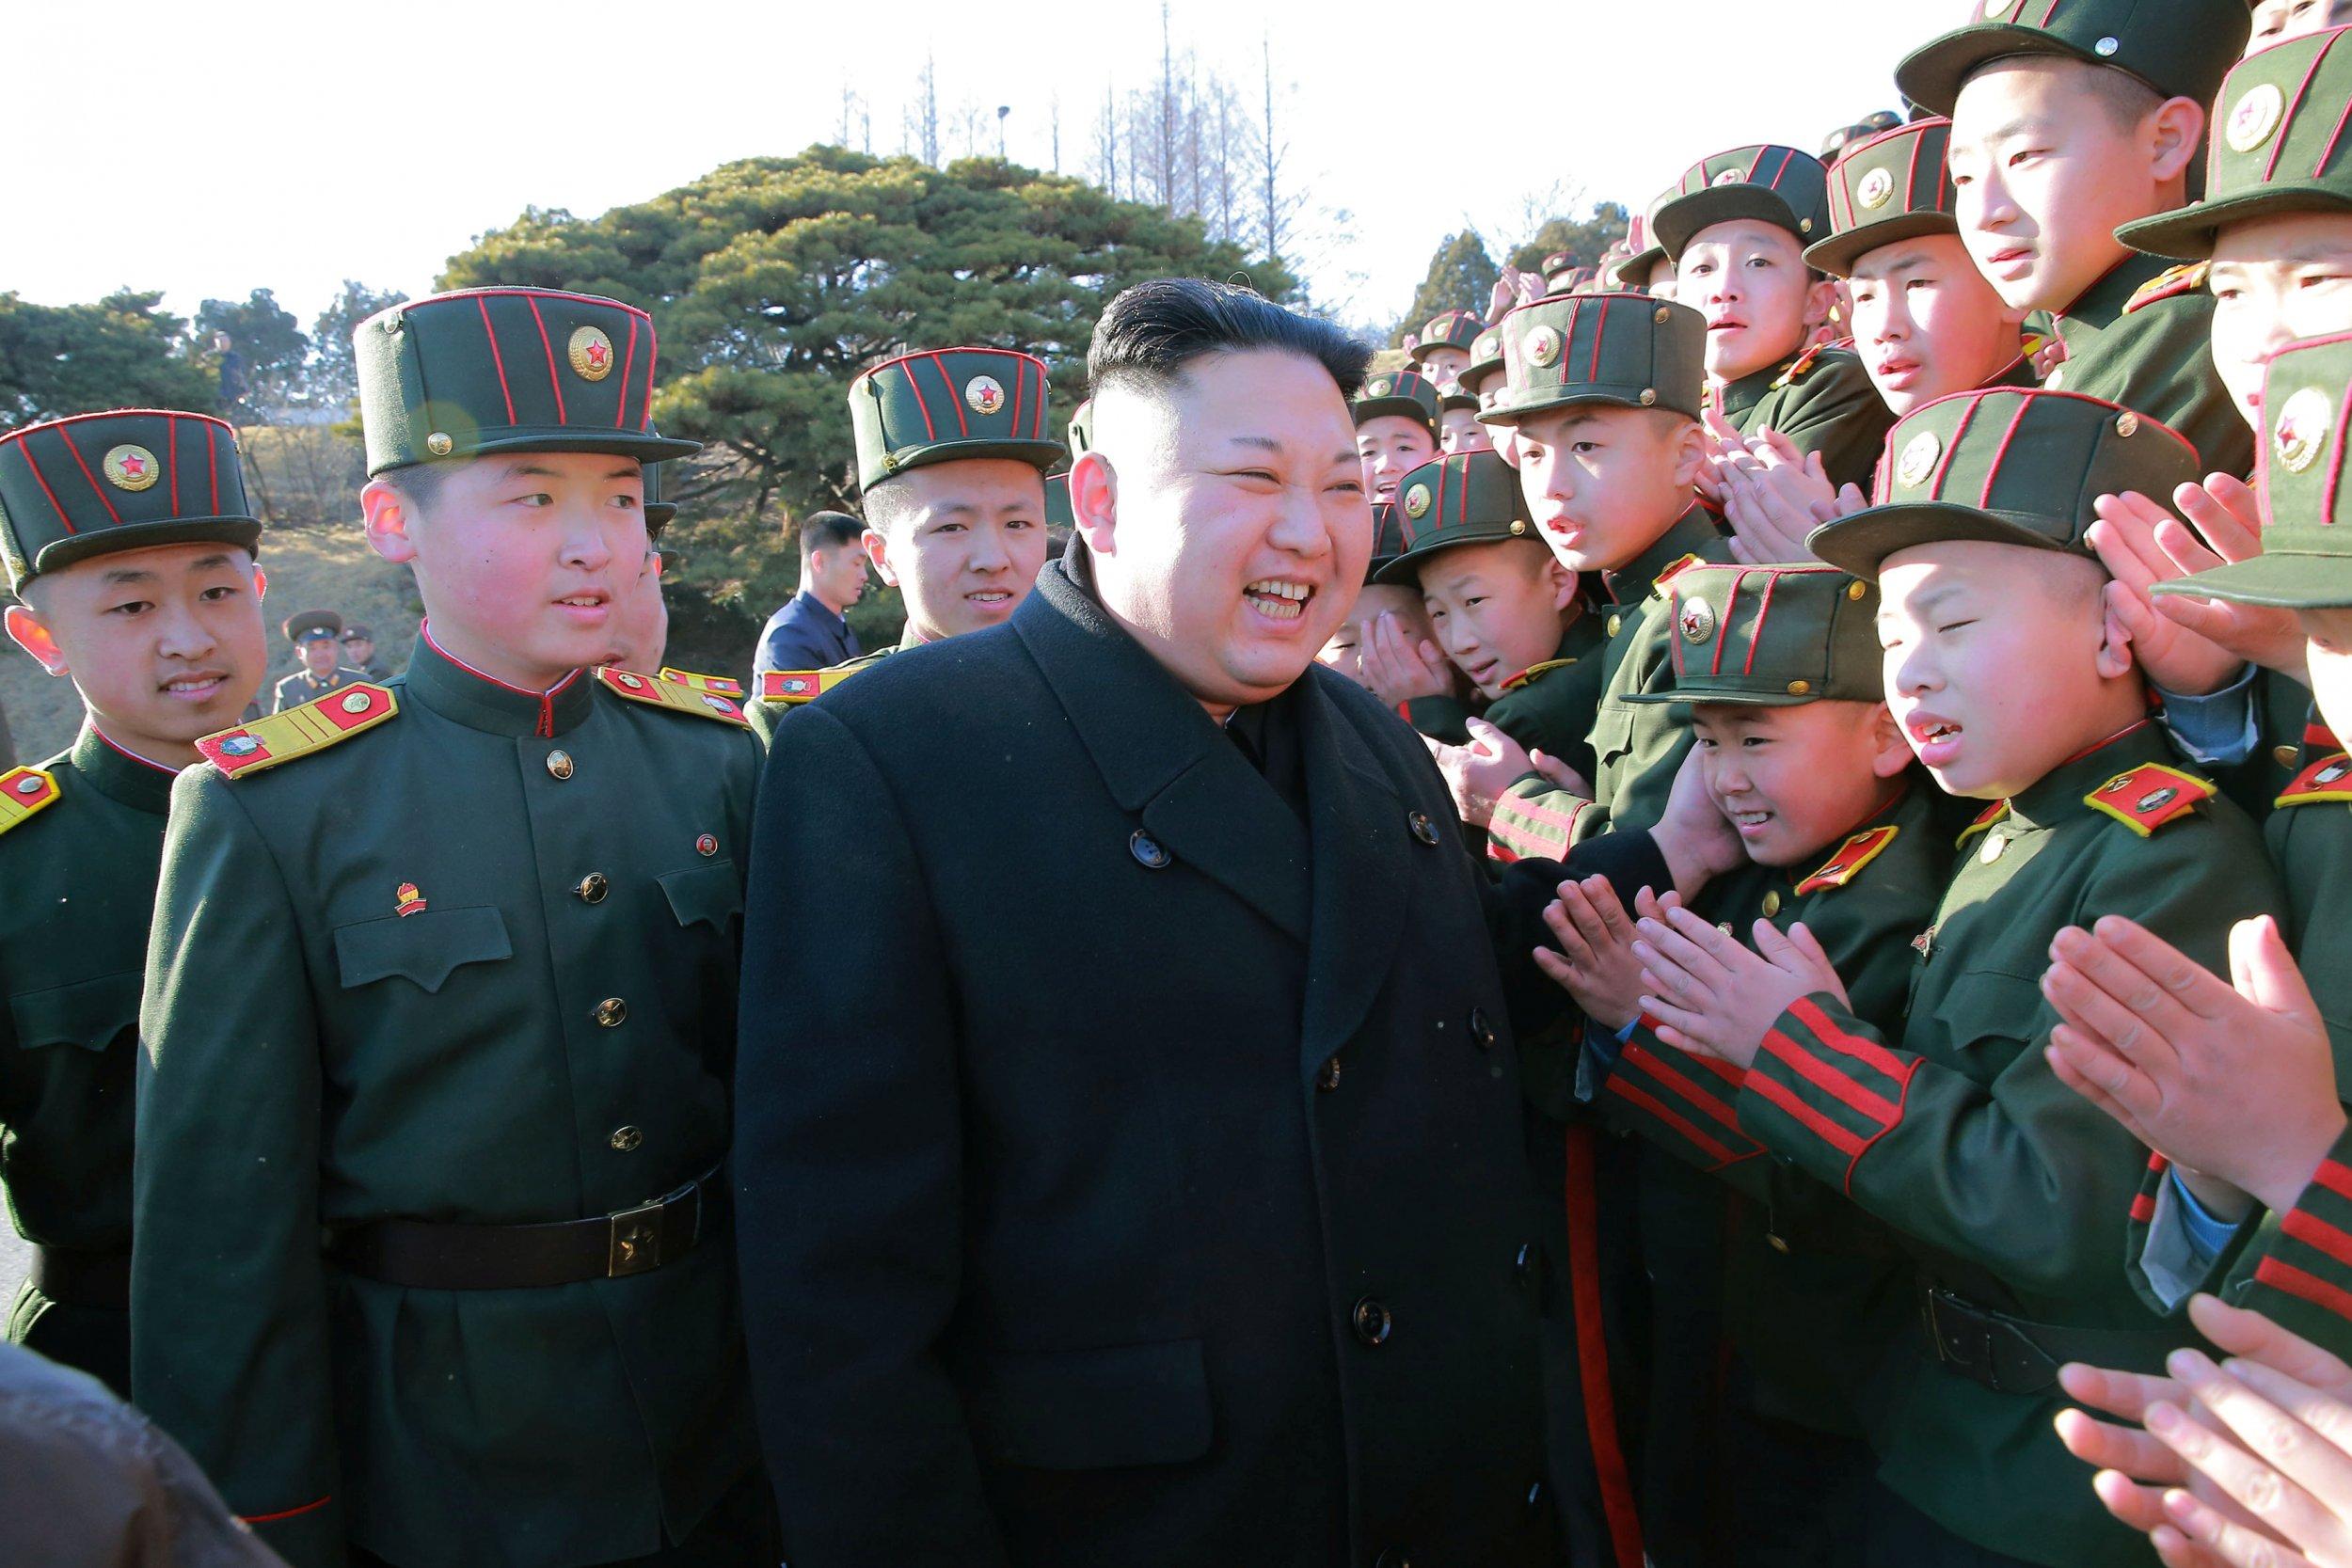 Kim Jong Un with kids